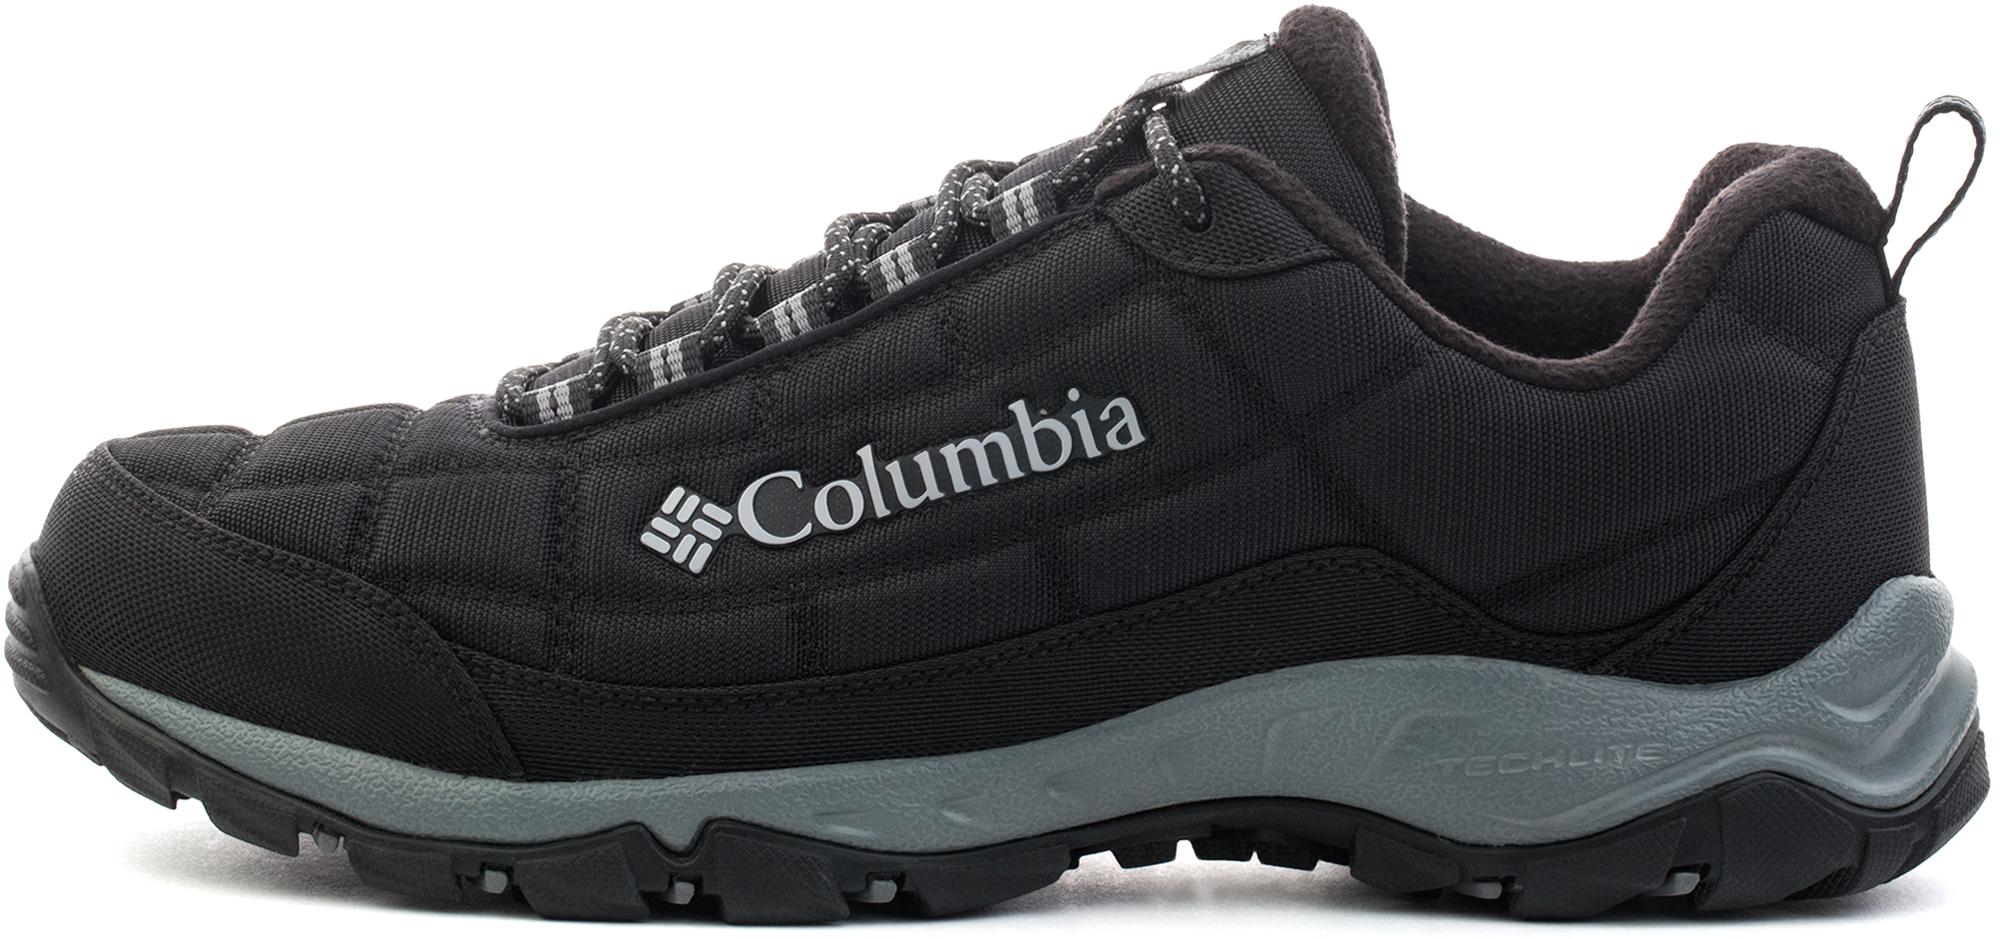 Columbia Ботинки мужские Firecamp, размер 46,5